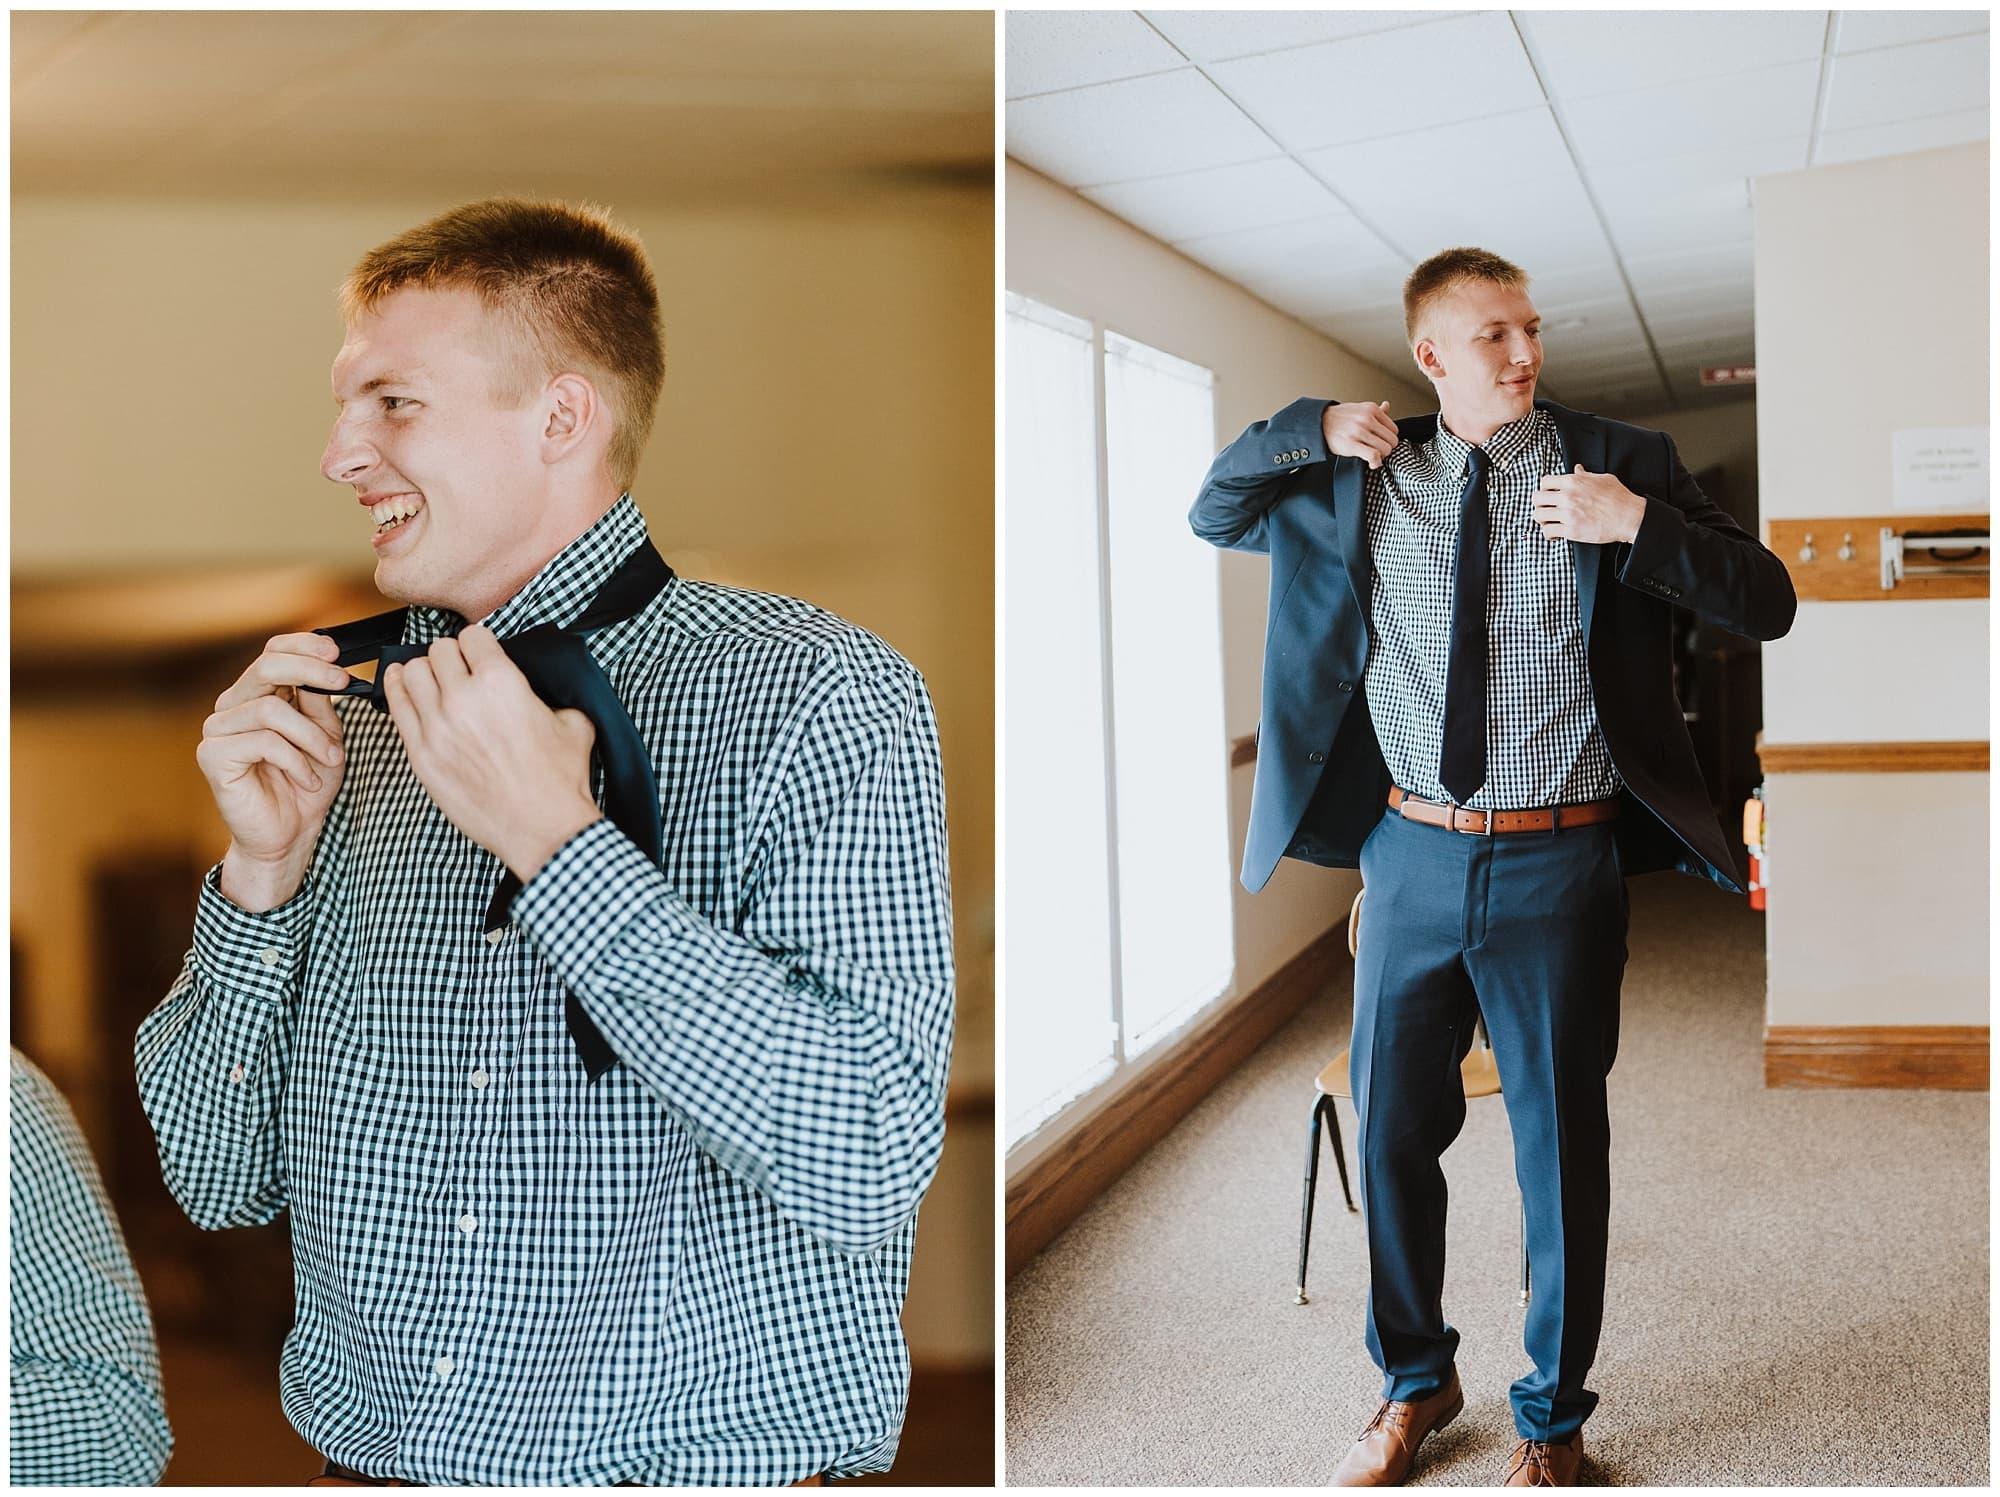 Adrian Michigan Wedding Photographer-4.JPG